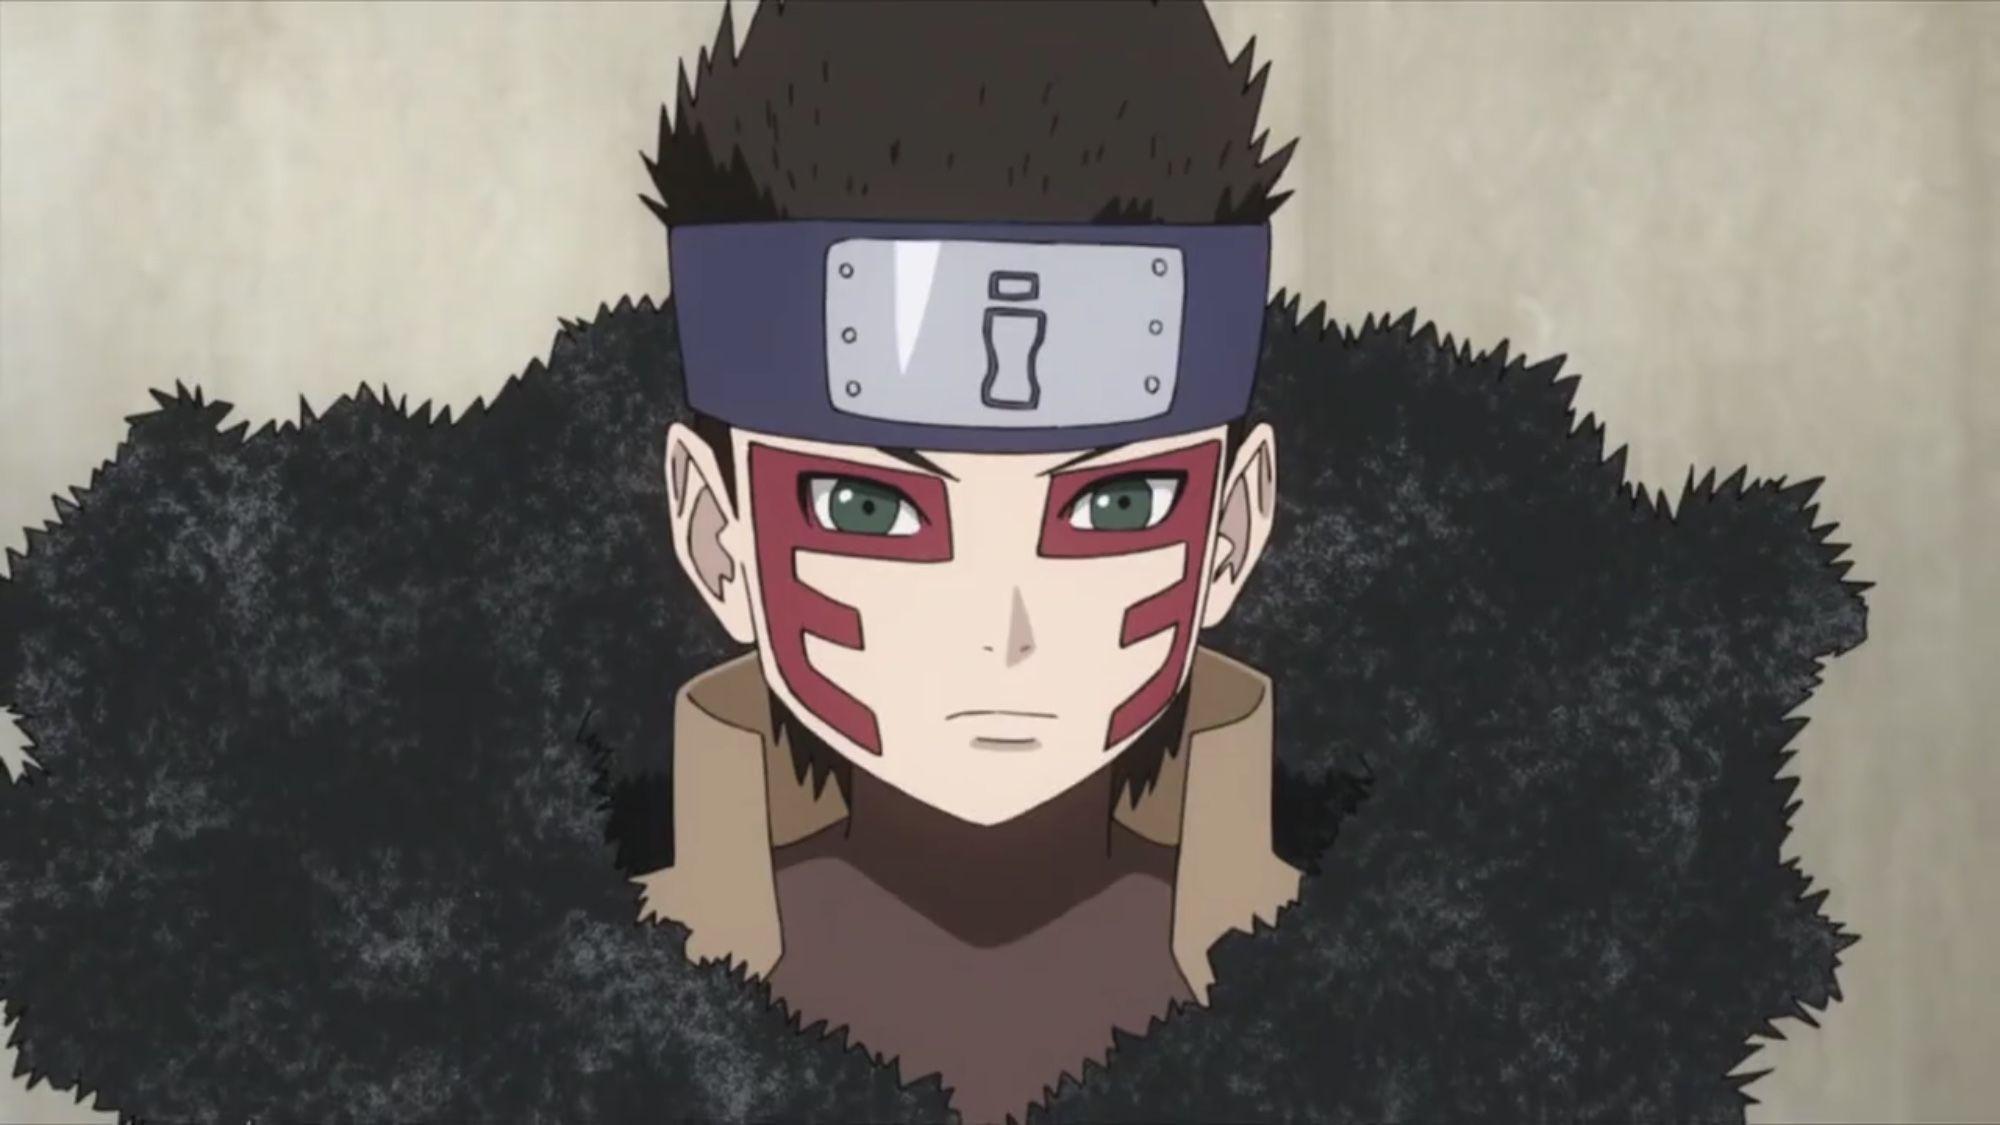 Pin By Elias Zara On Naruto Anime Naruto Naruto Sasuke Sakura Anime